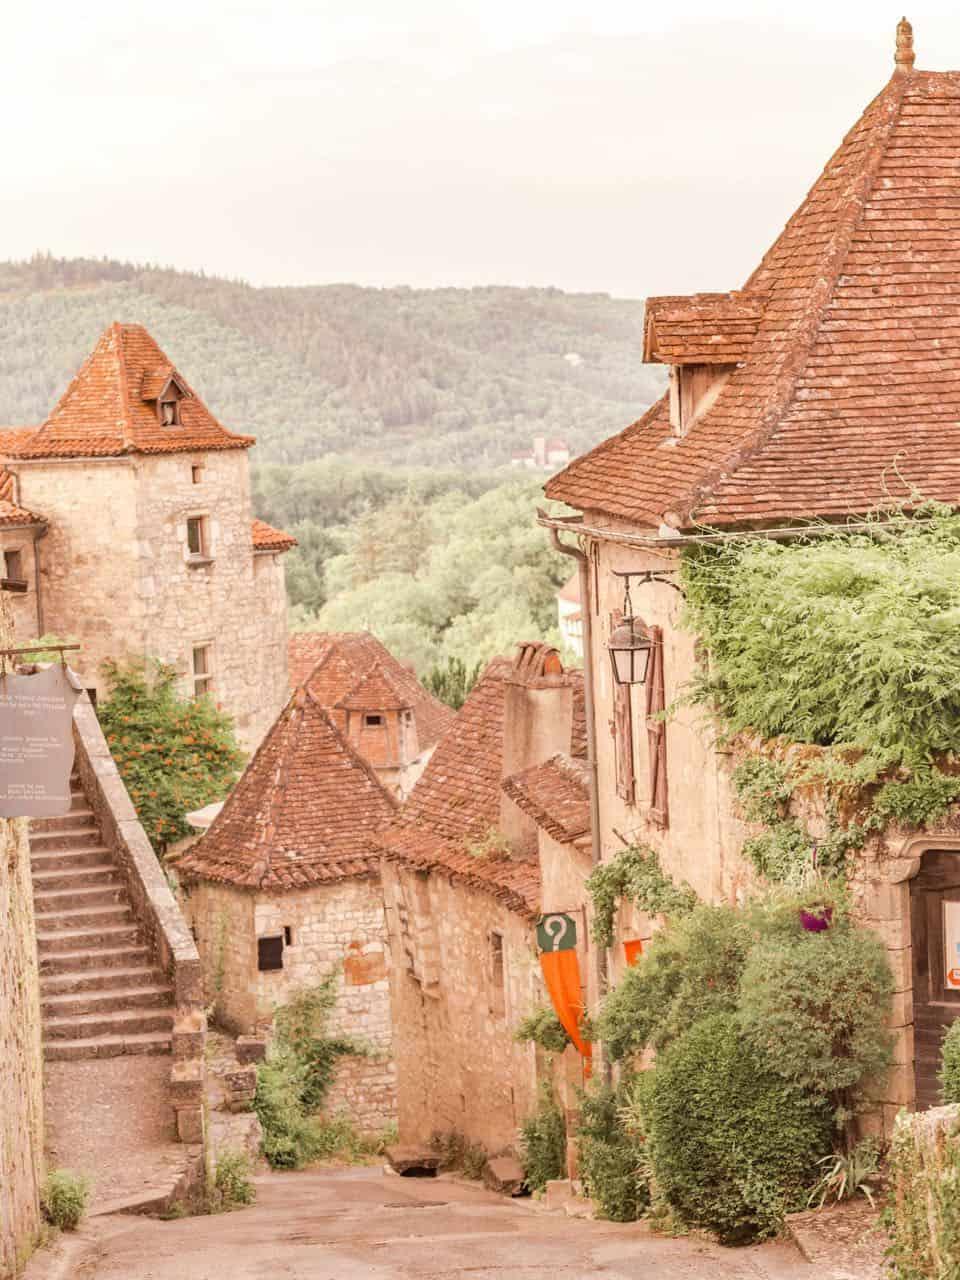 southwest France travel guide